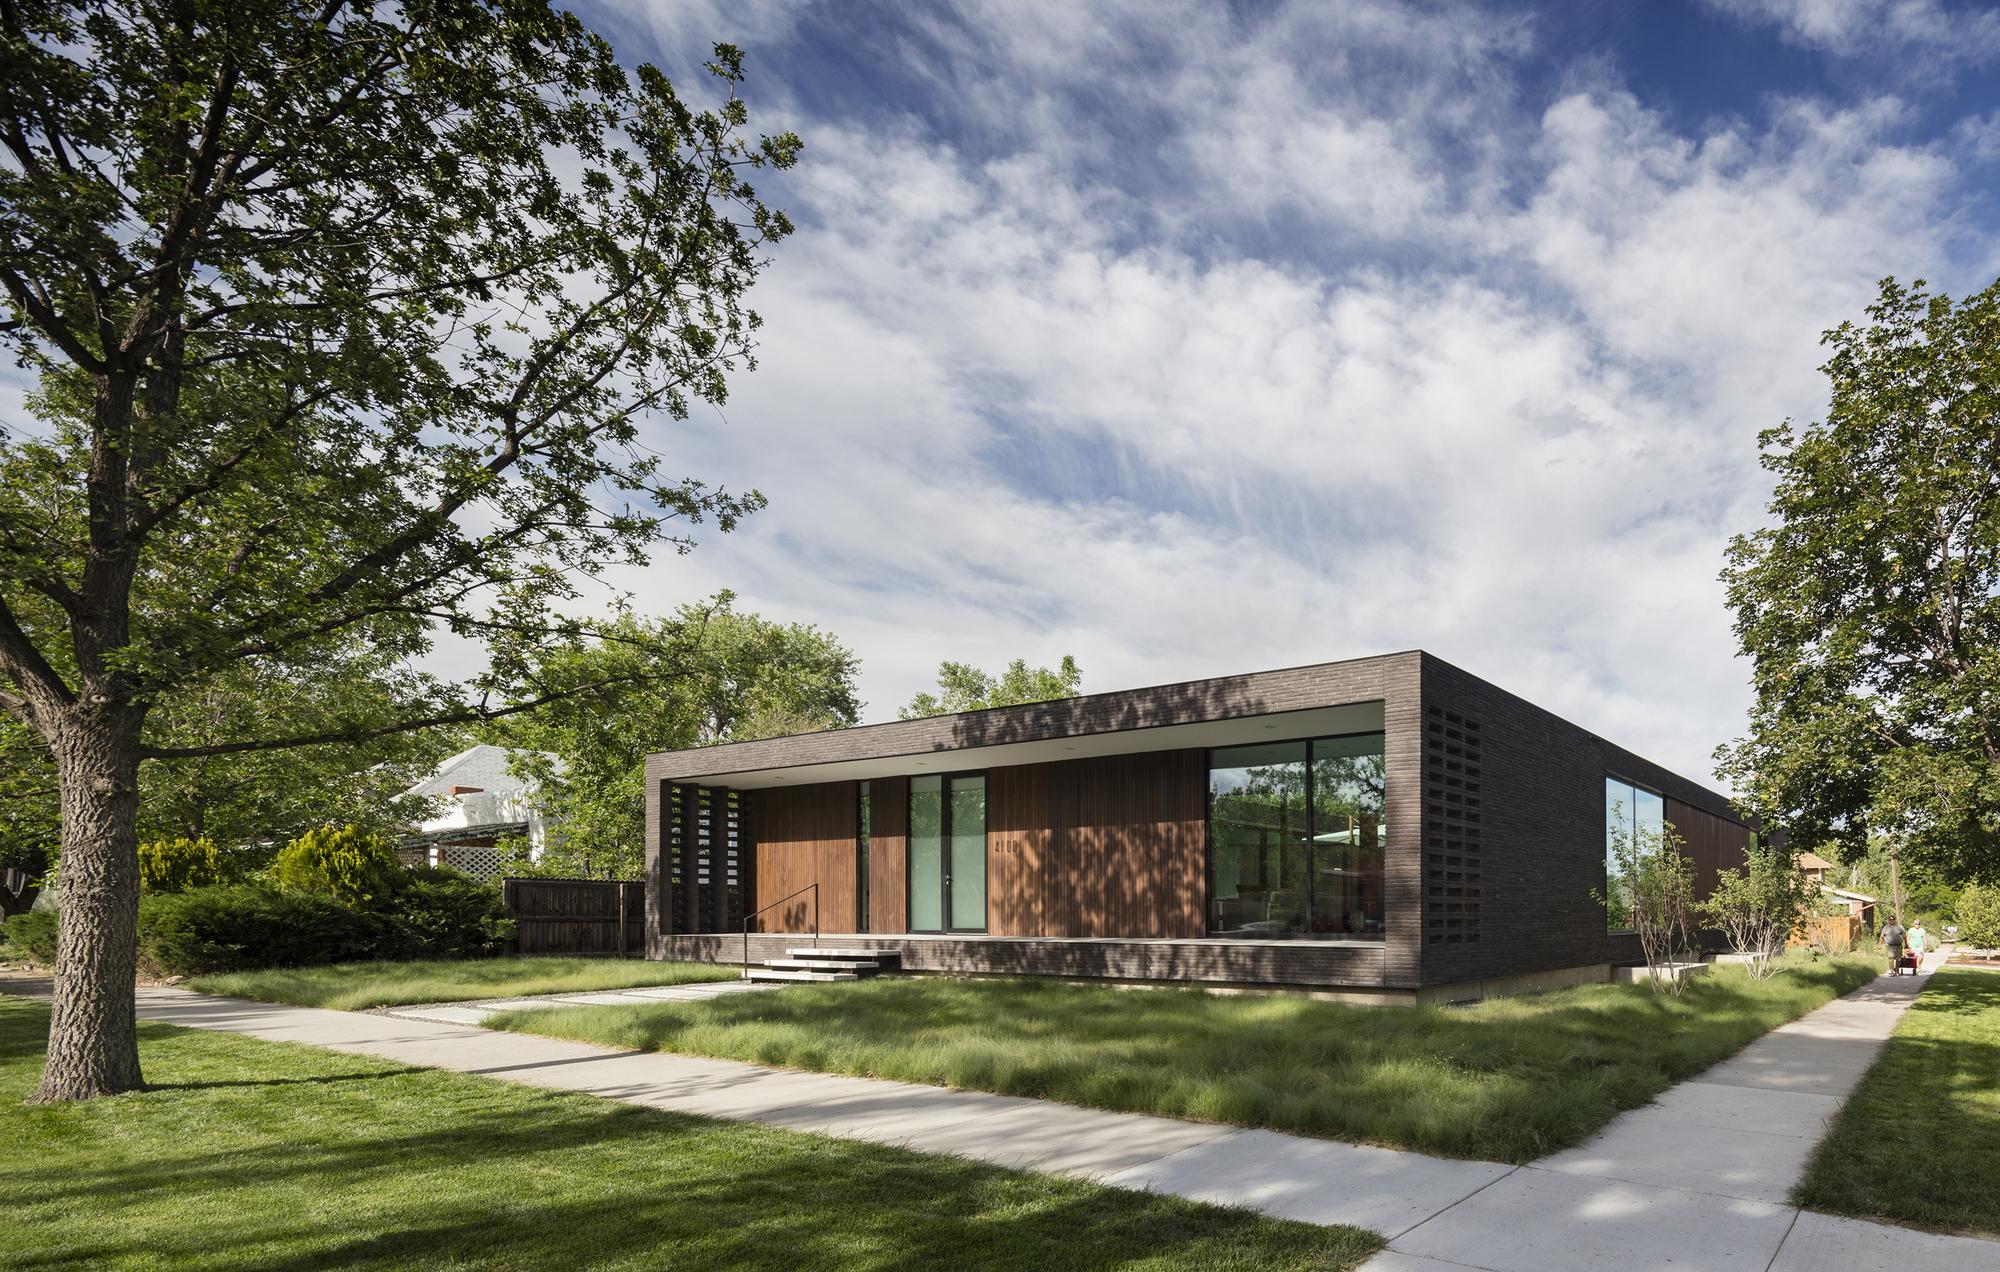 Brick City House / Studio B Architecture + Interiors